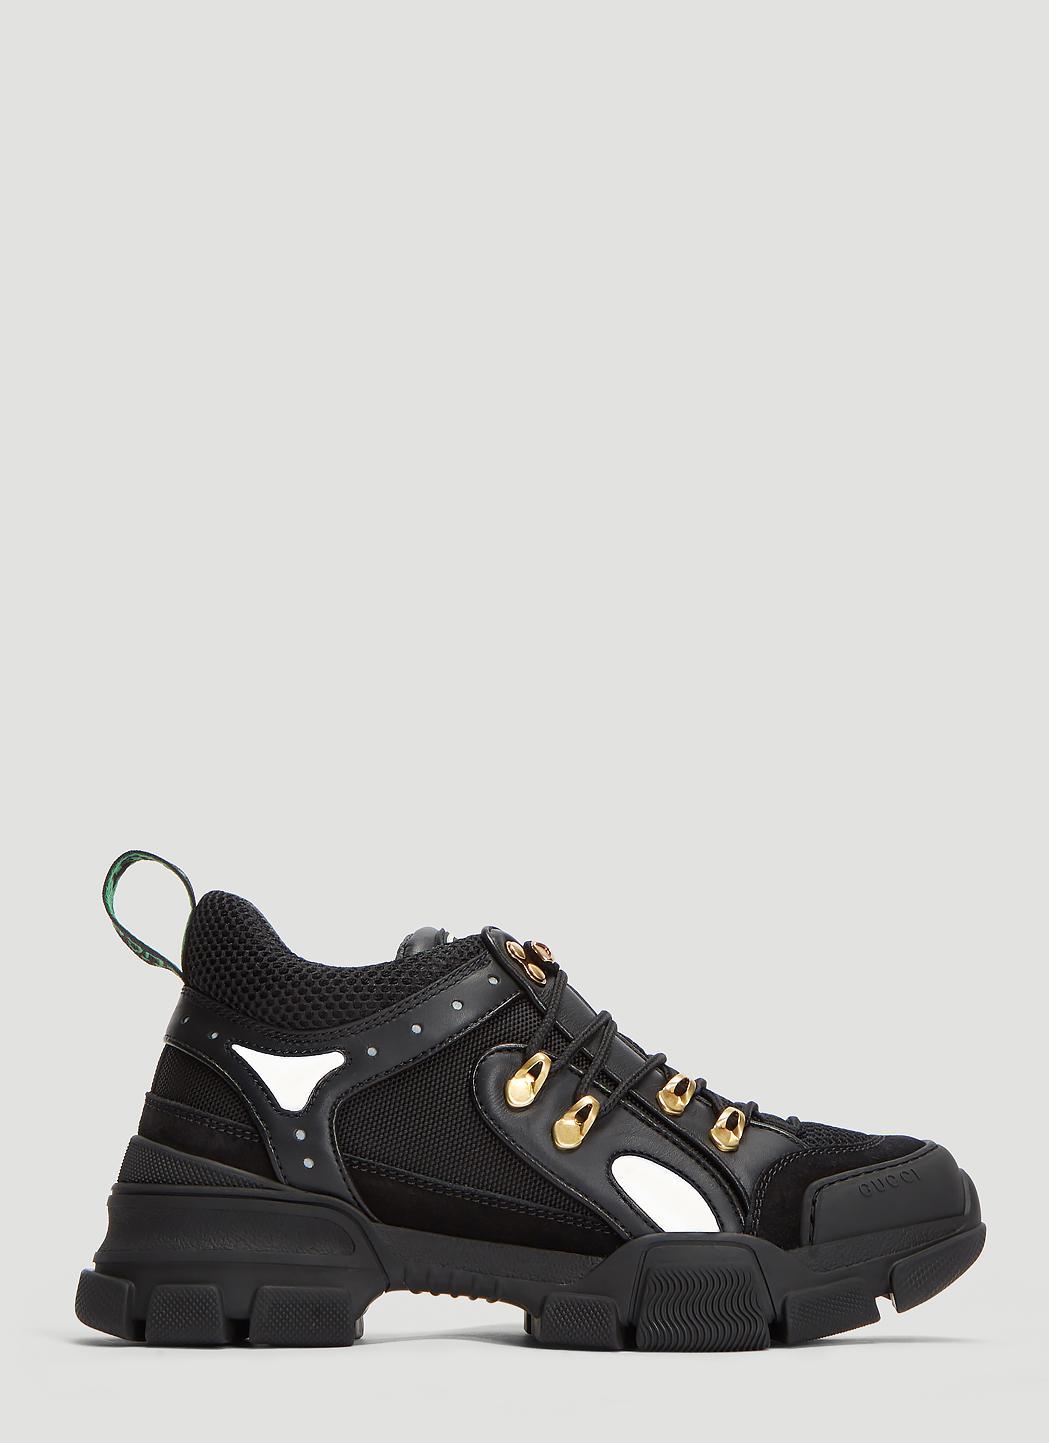 a69daaf169c8 Lyst - Gucci Chunky Flashtrek Sneakers in Black - Save 21%